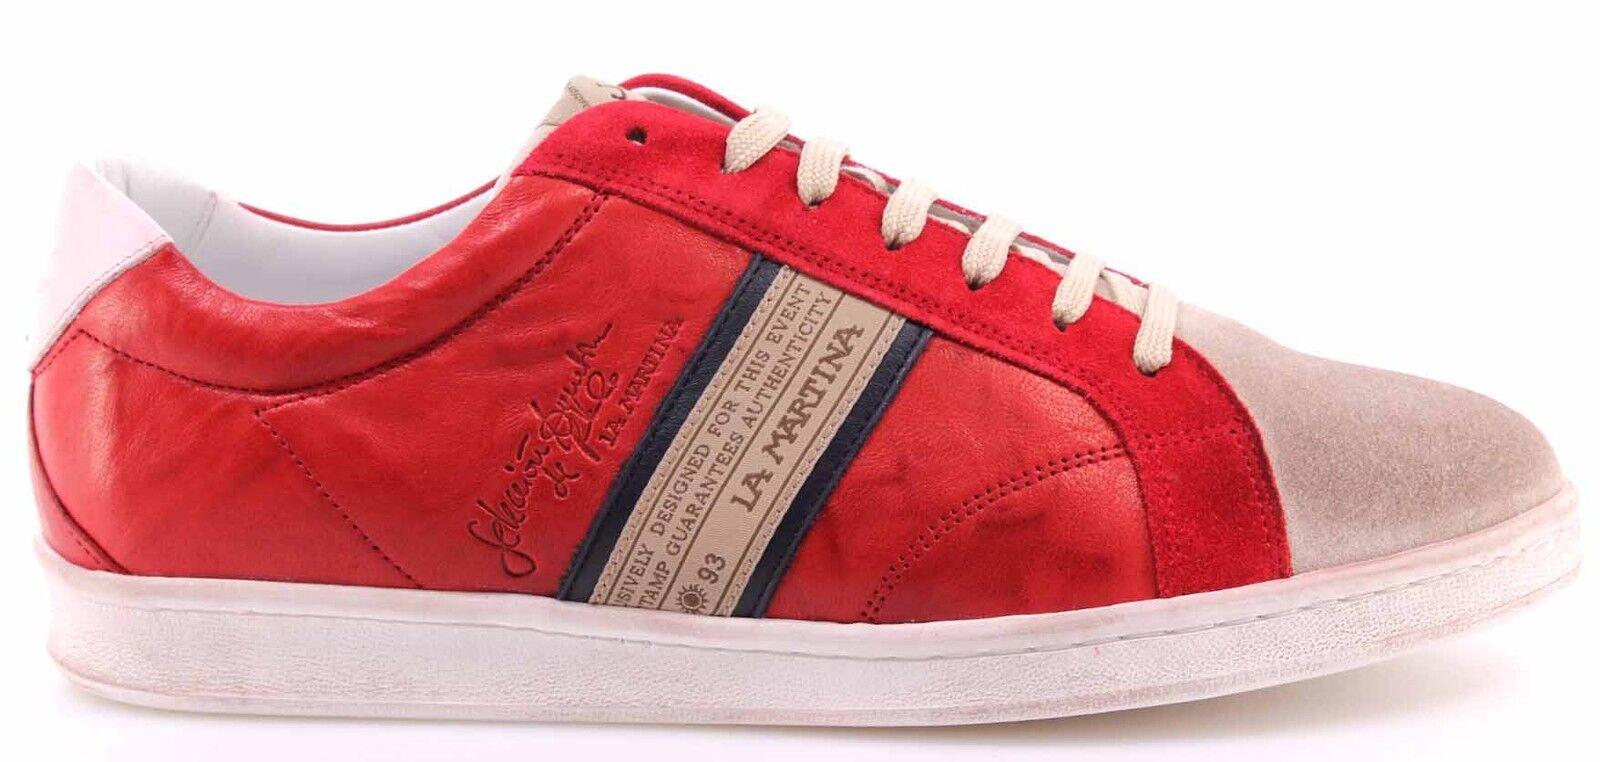 Herren Schuhe Sneakers LA MARTINA L3006204 Camoscio Farro Plutone Rubino Rot Neu